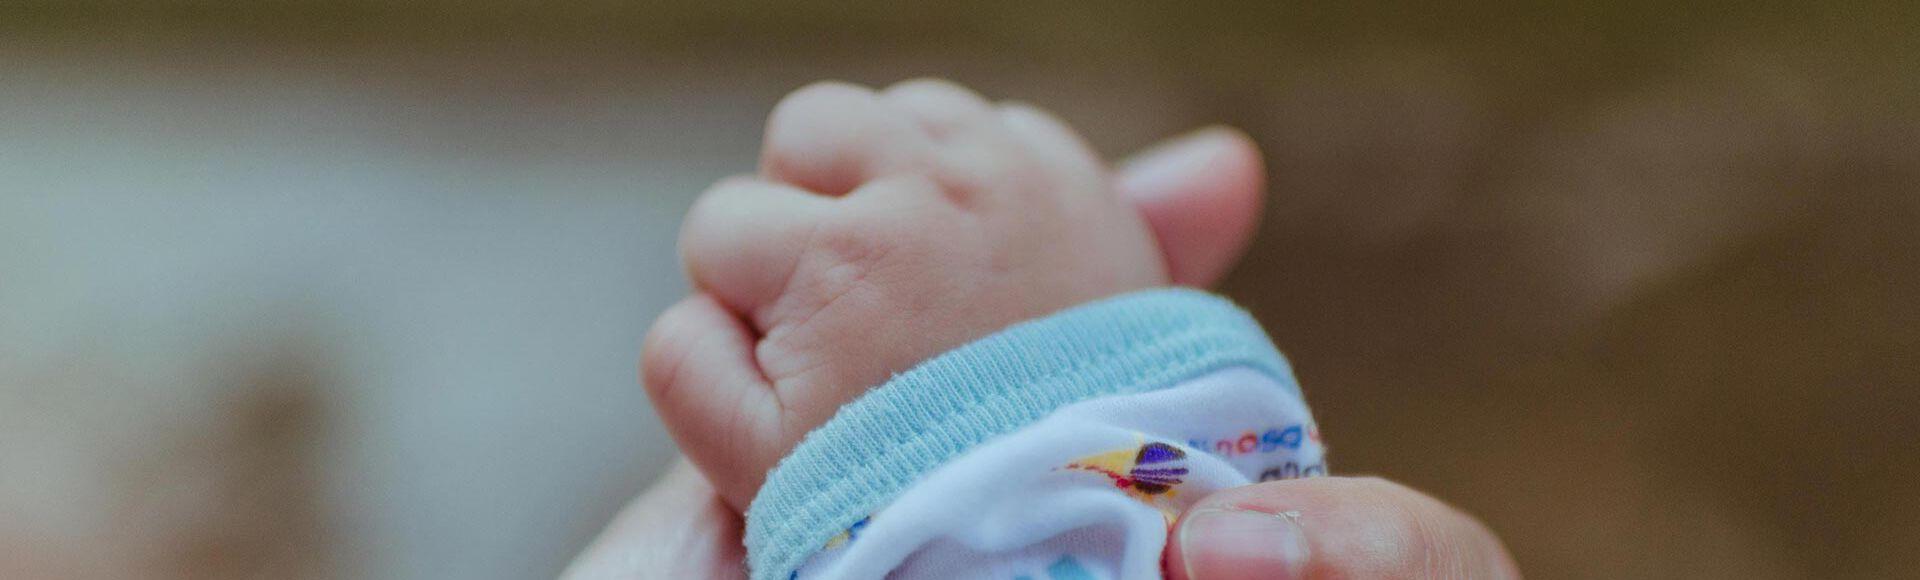 Fortalecer as defesas dos bebês